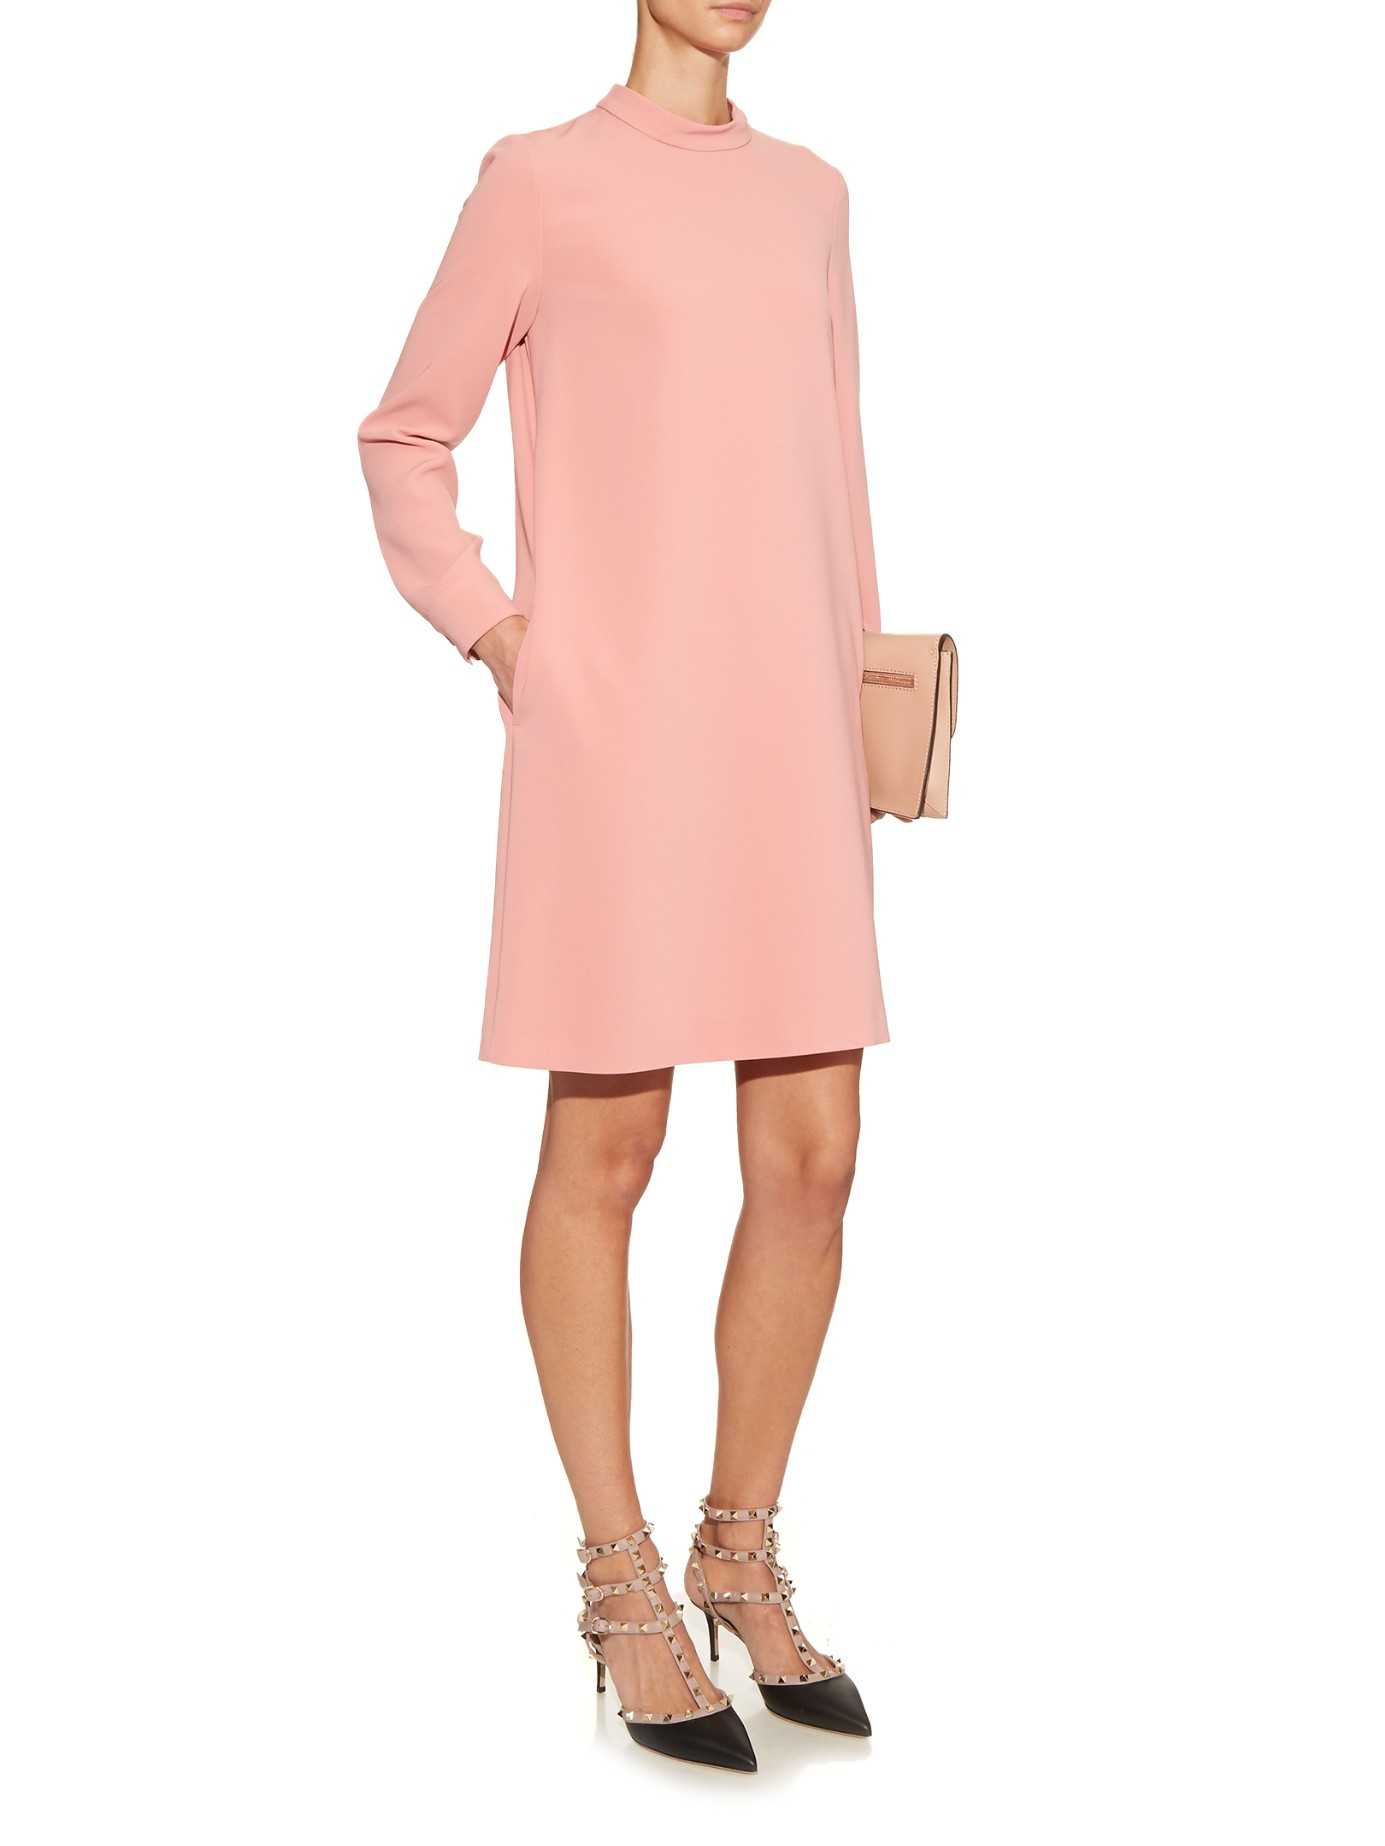 max mara studio ozieri dress in pink lyst. Black Bedroom Furniture Sets. Home Design Ideas